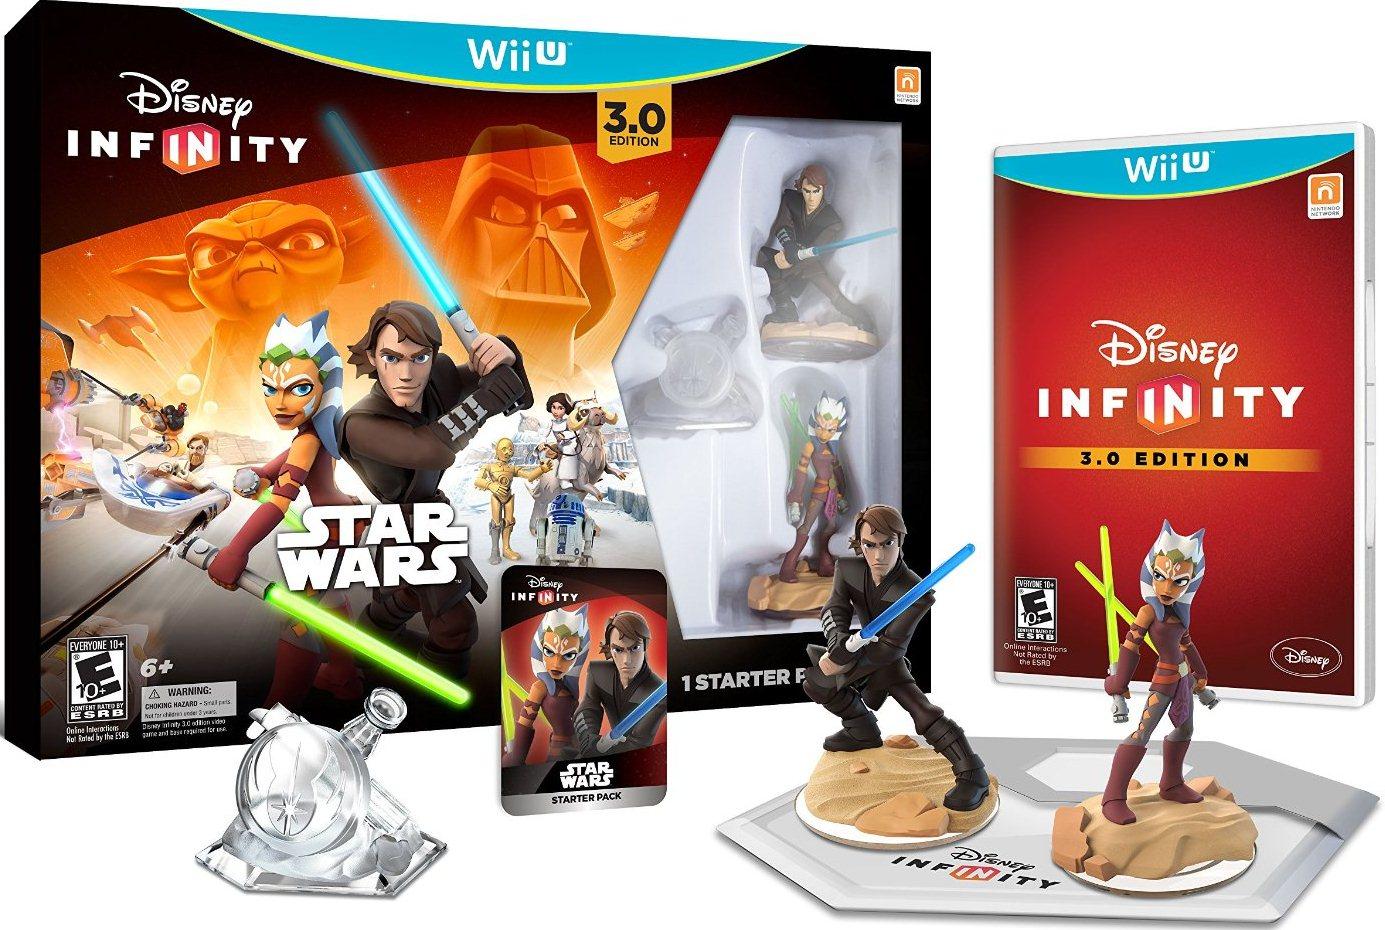 Disney Infinity 712725026745 3.0 Star Wars Gaming Figures Starter (Refurbished) by